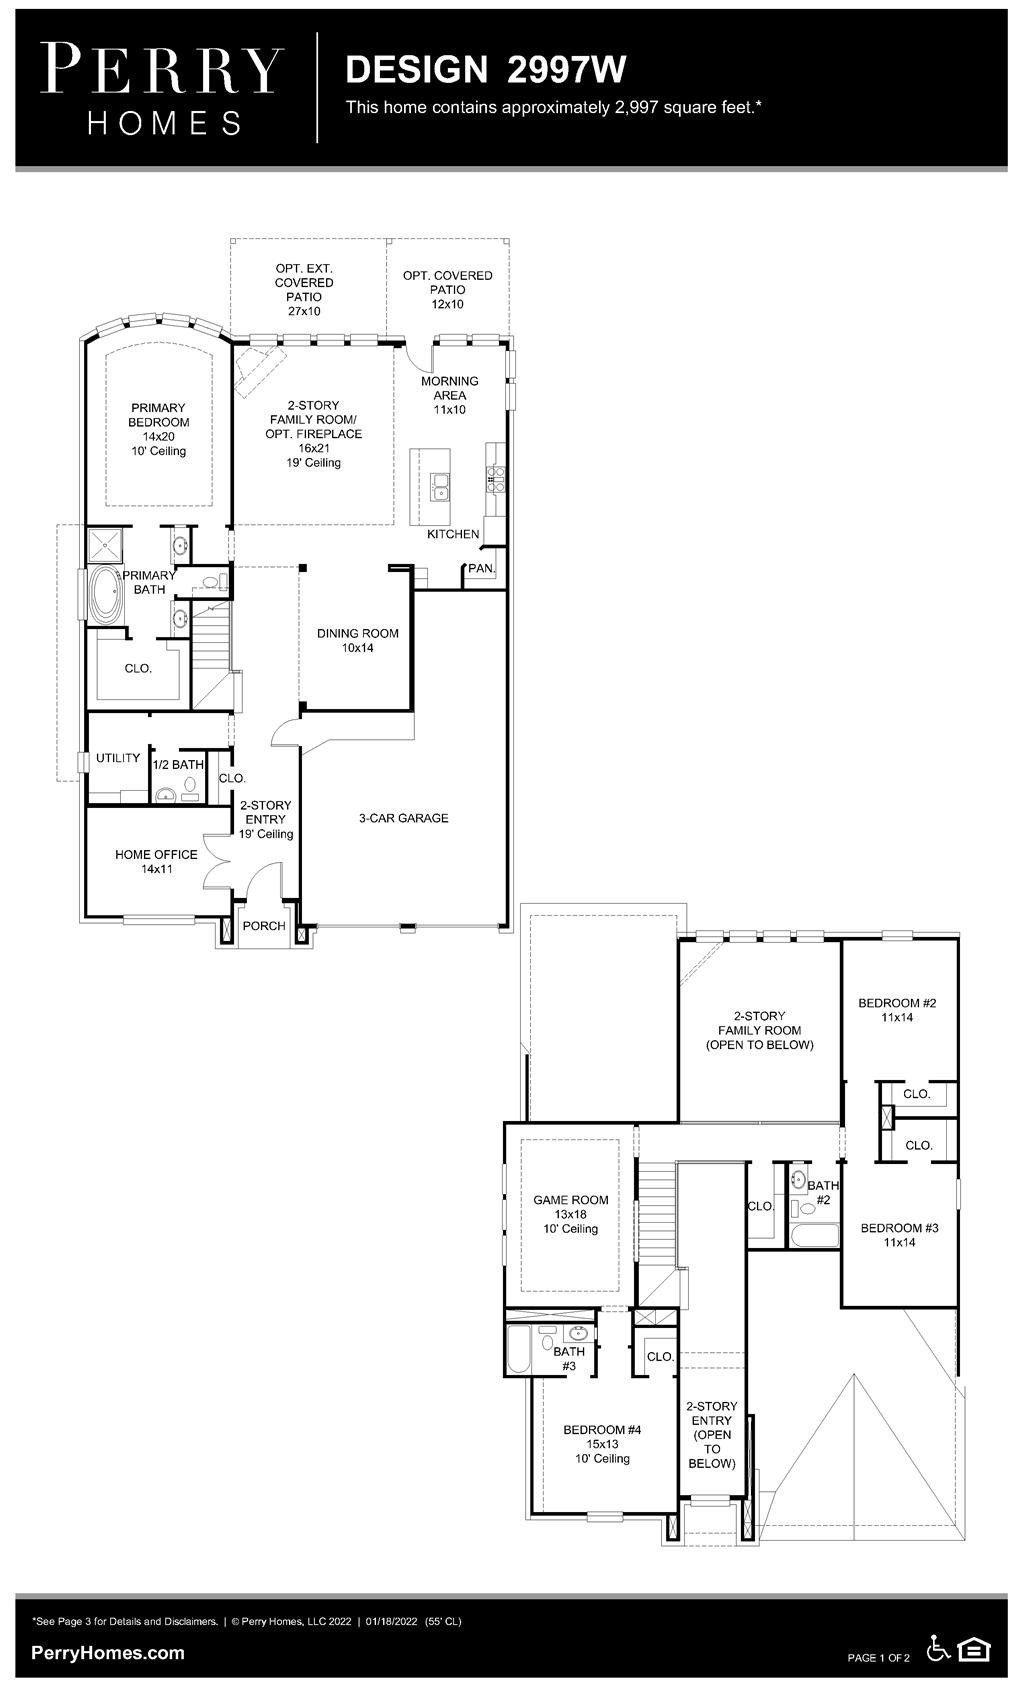 Floor Plan for 2997W